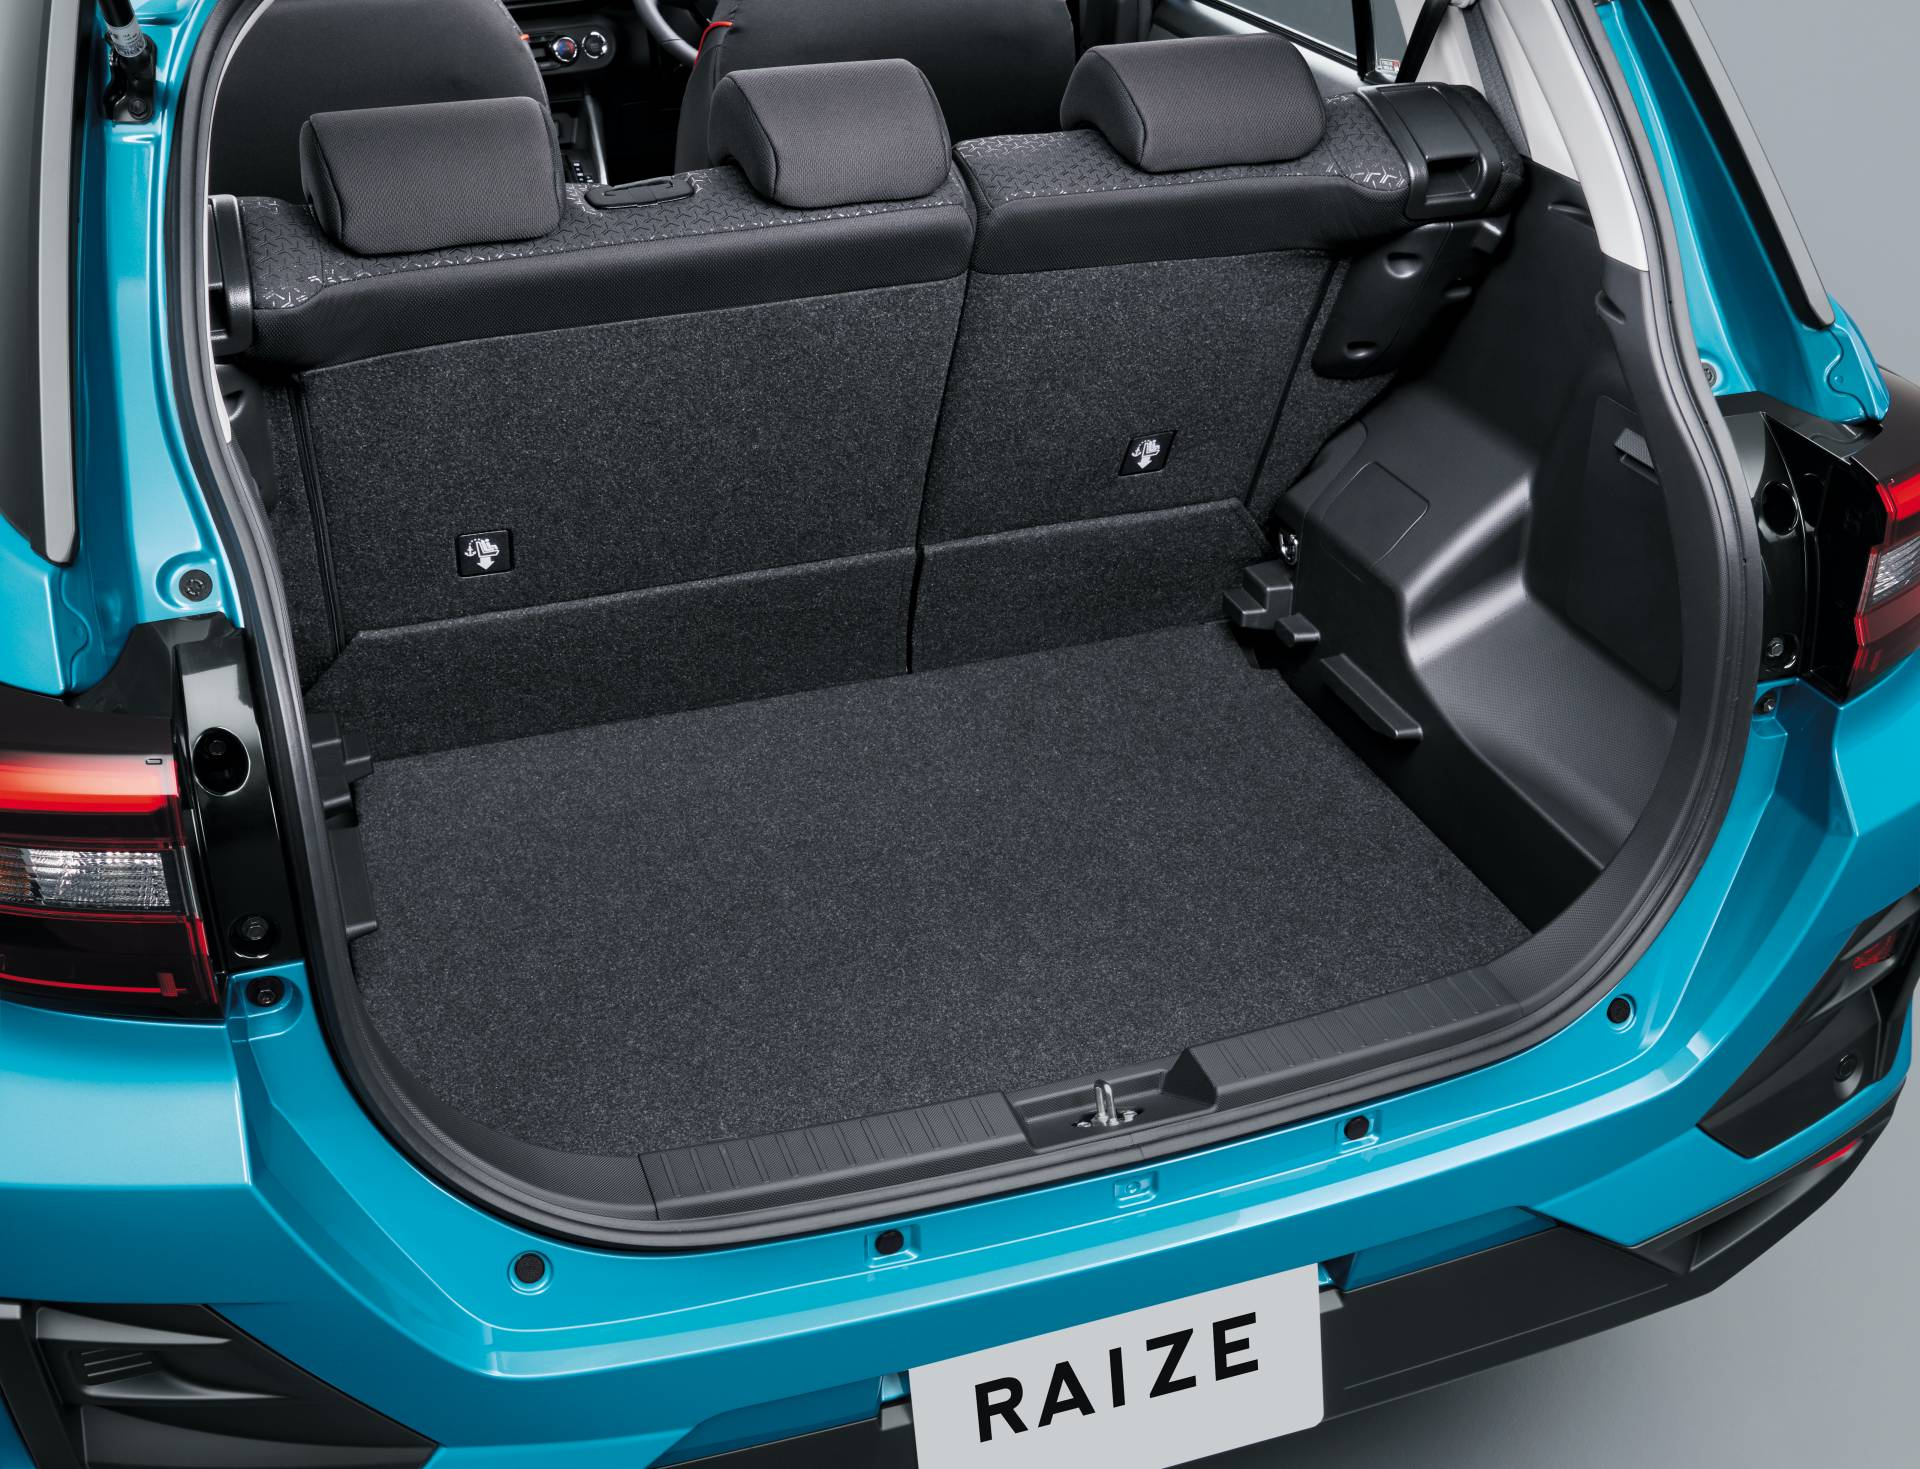 2020_Toyota_Raize_0011